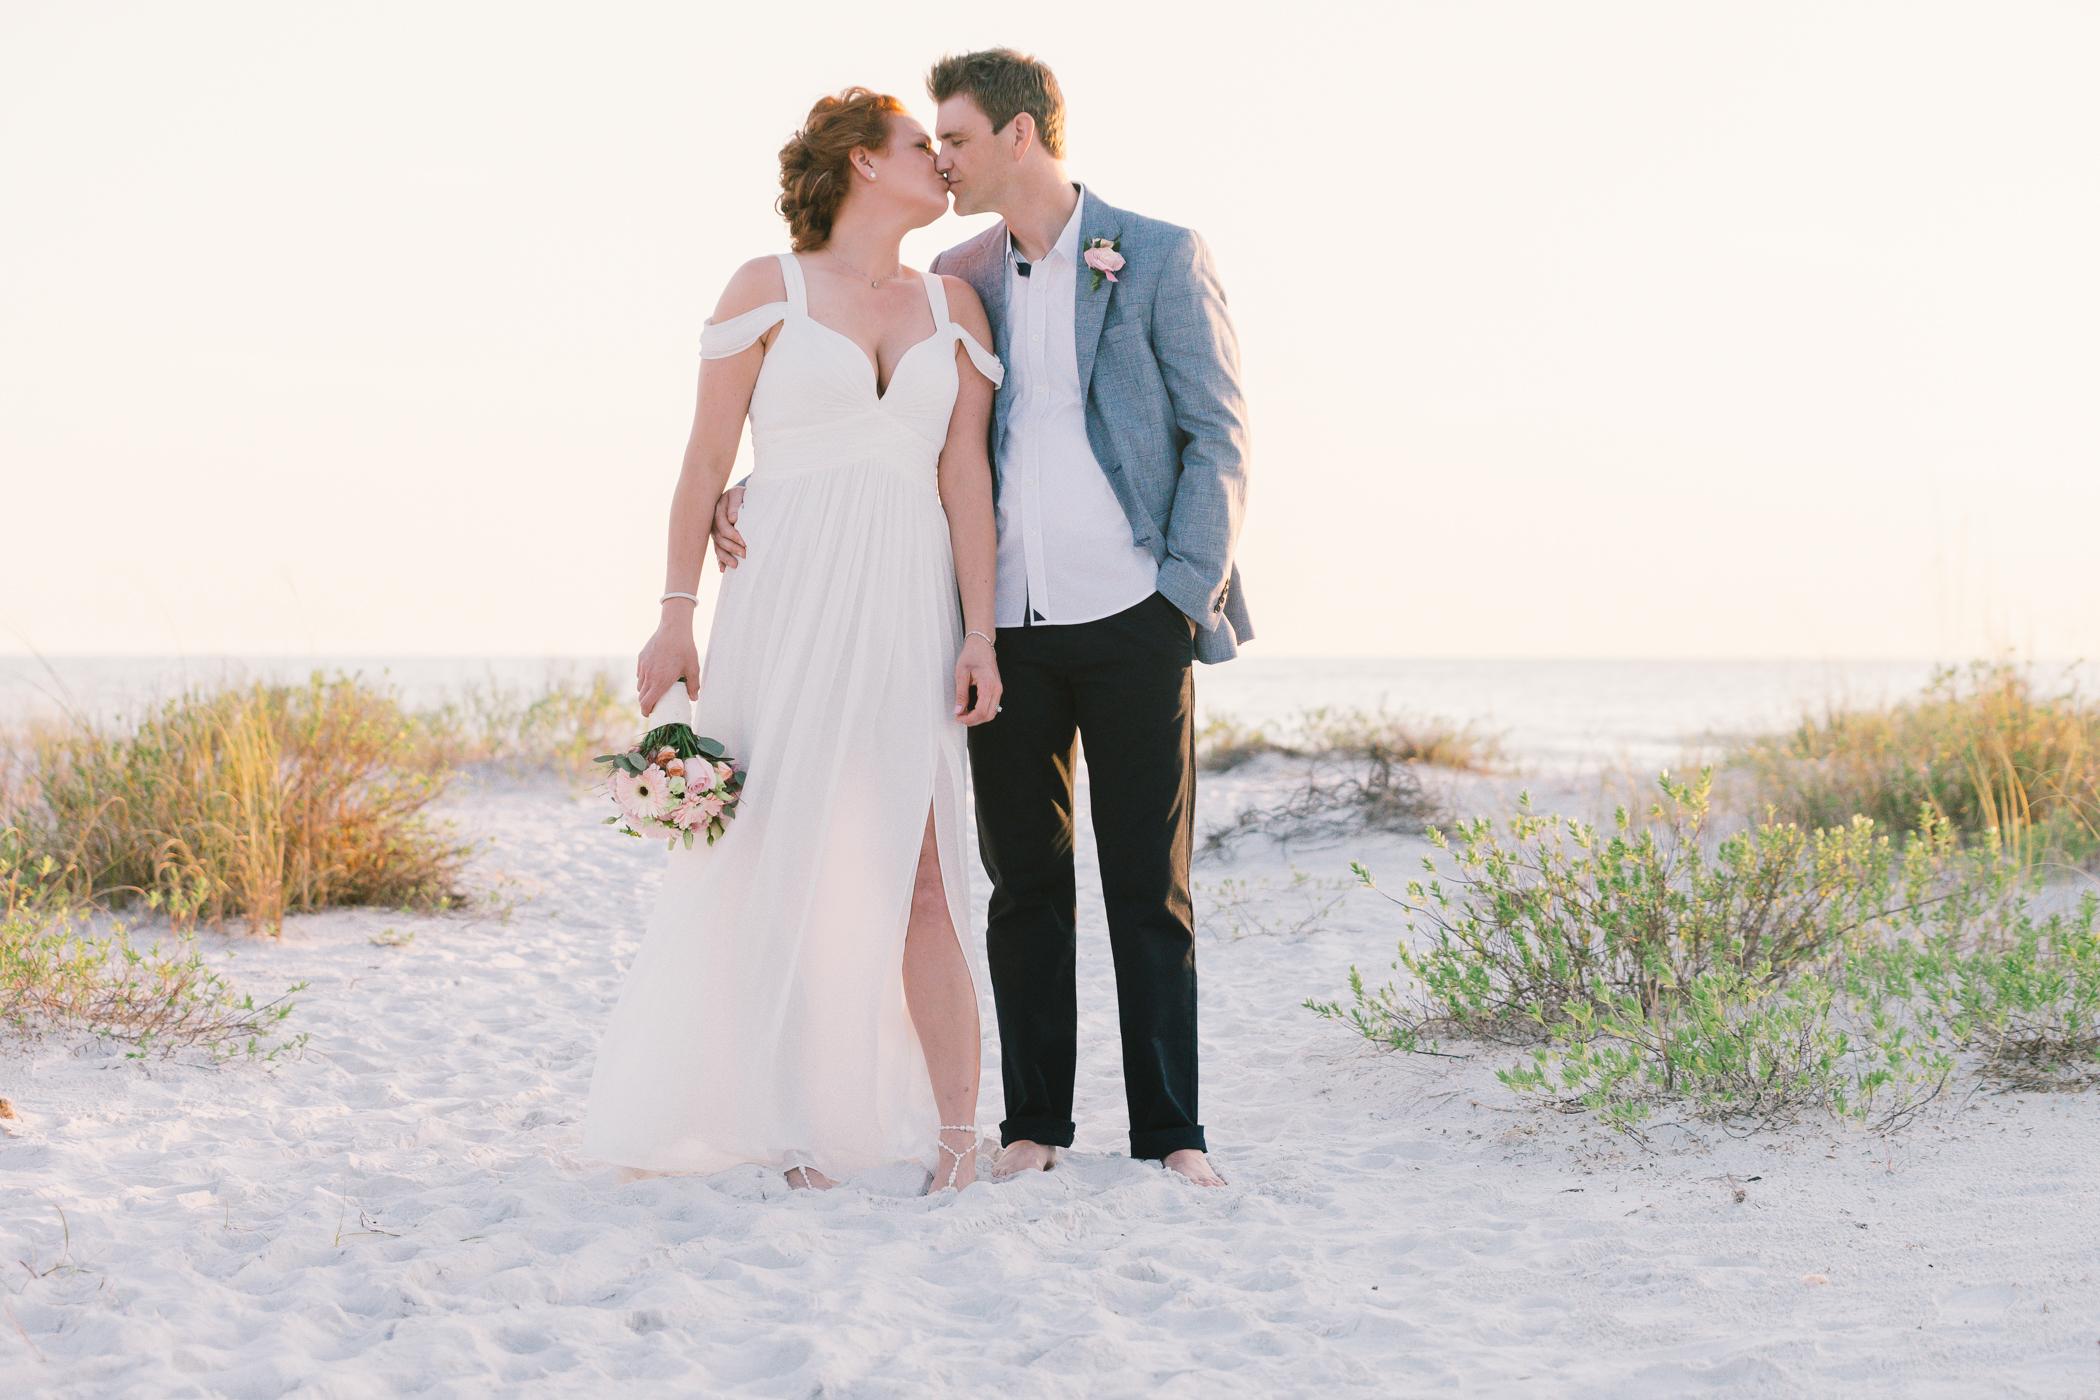 Lido-beach-wedding, Sarasota-wedding-photographer